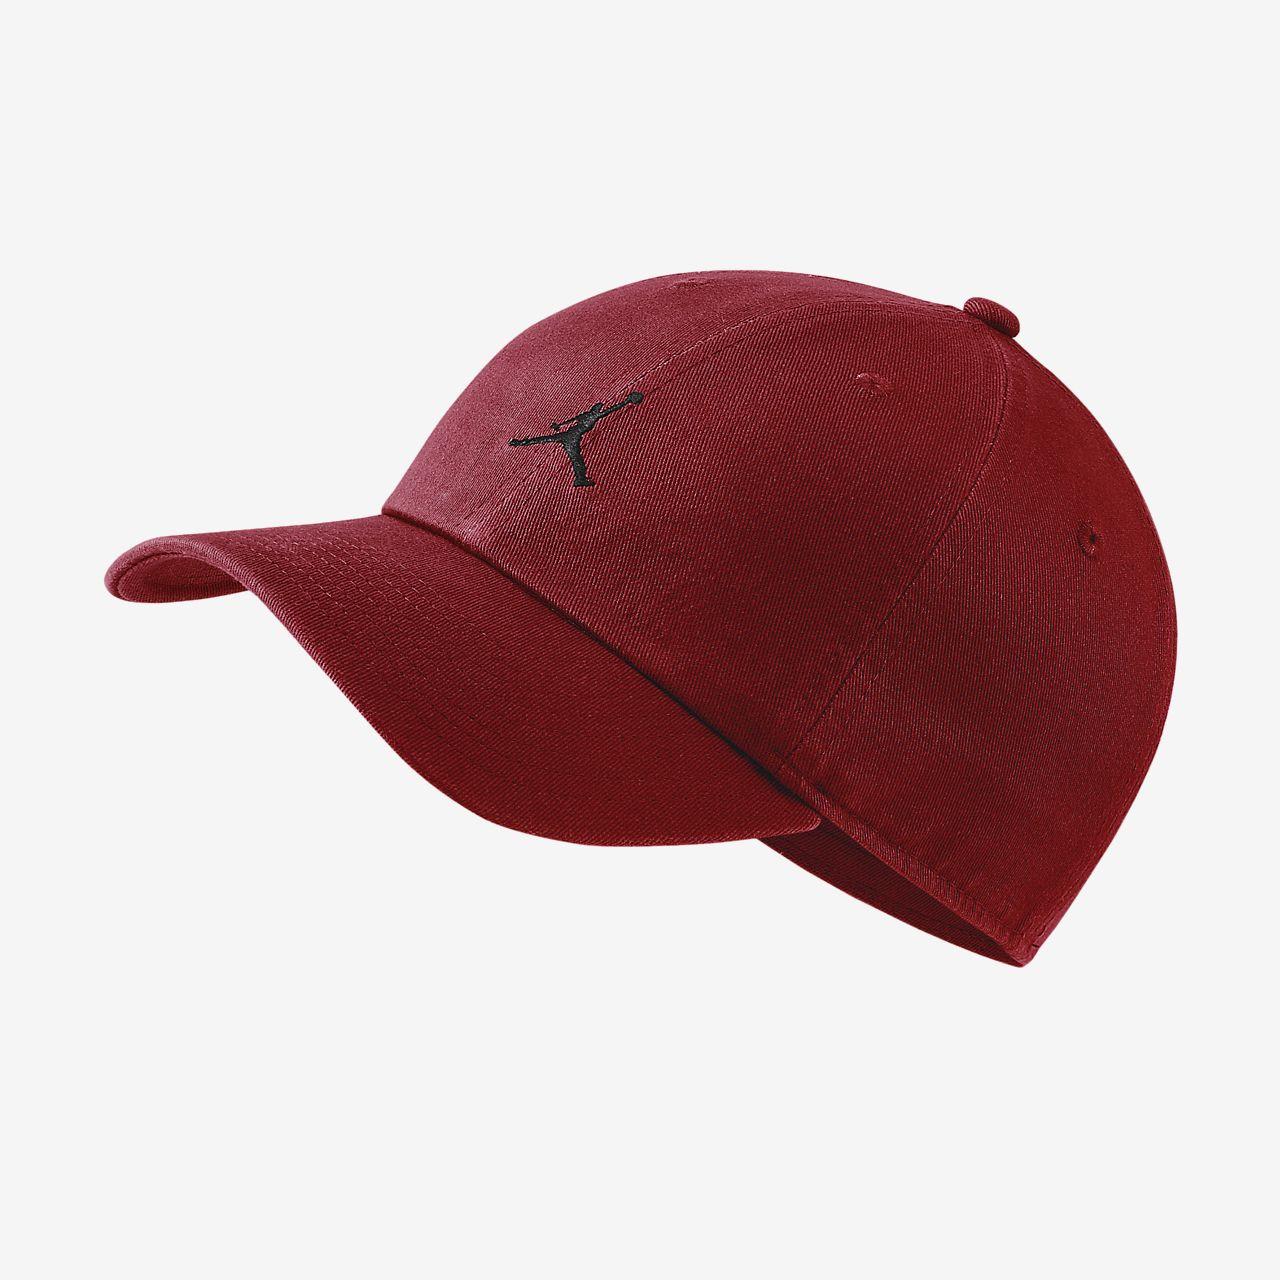 23a8244c8 Jordan Jumpman Heritage 86 Adjustable Hat. Nike.com CA